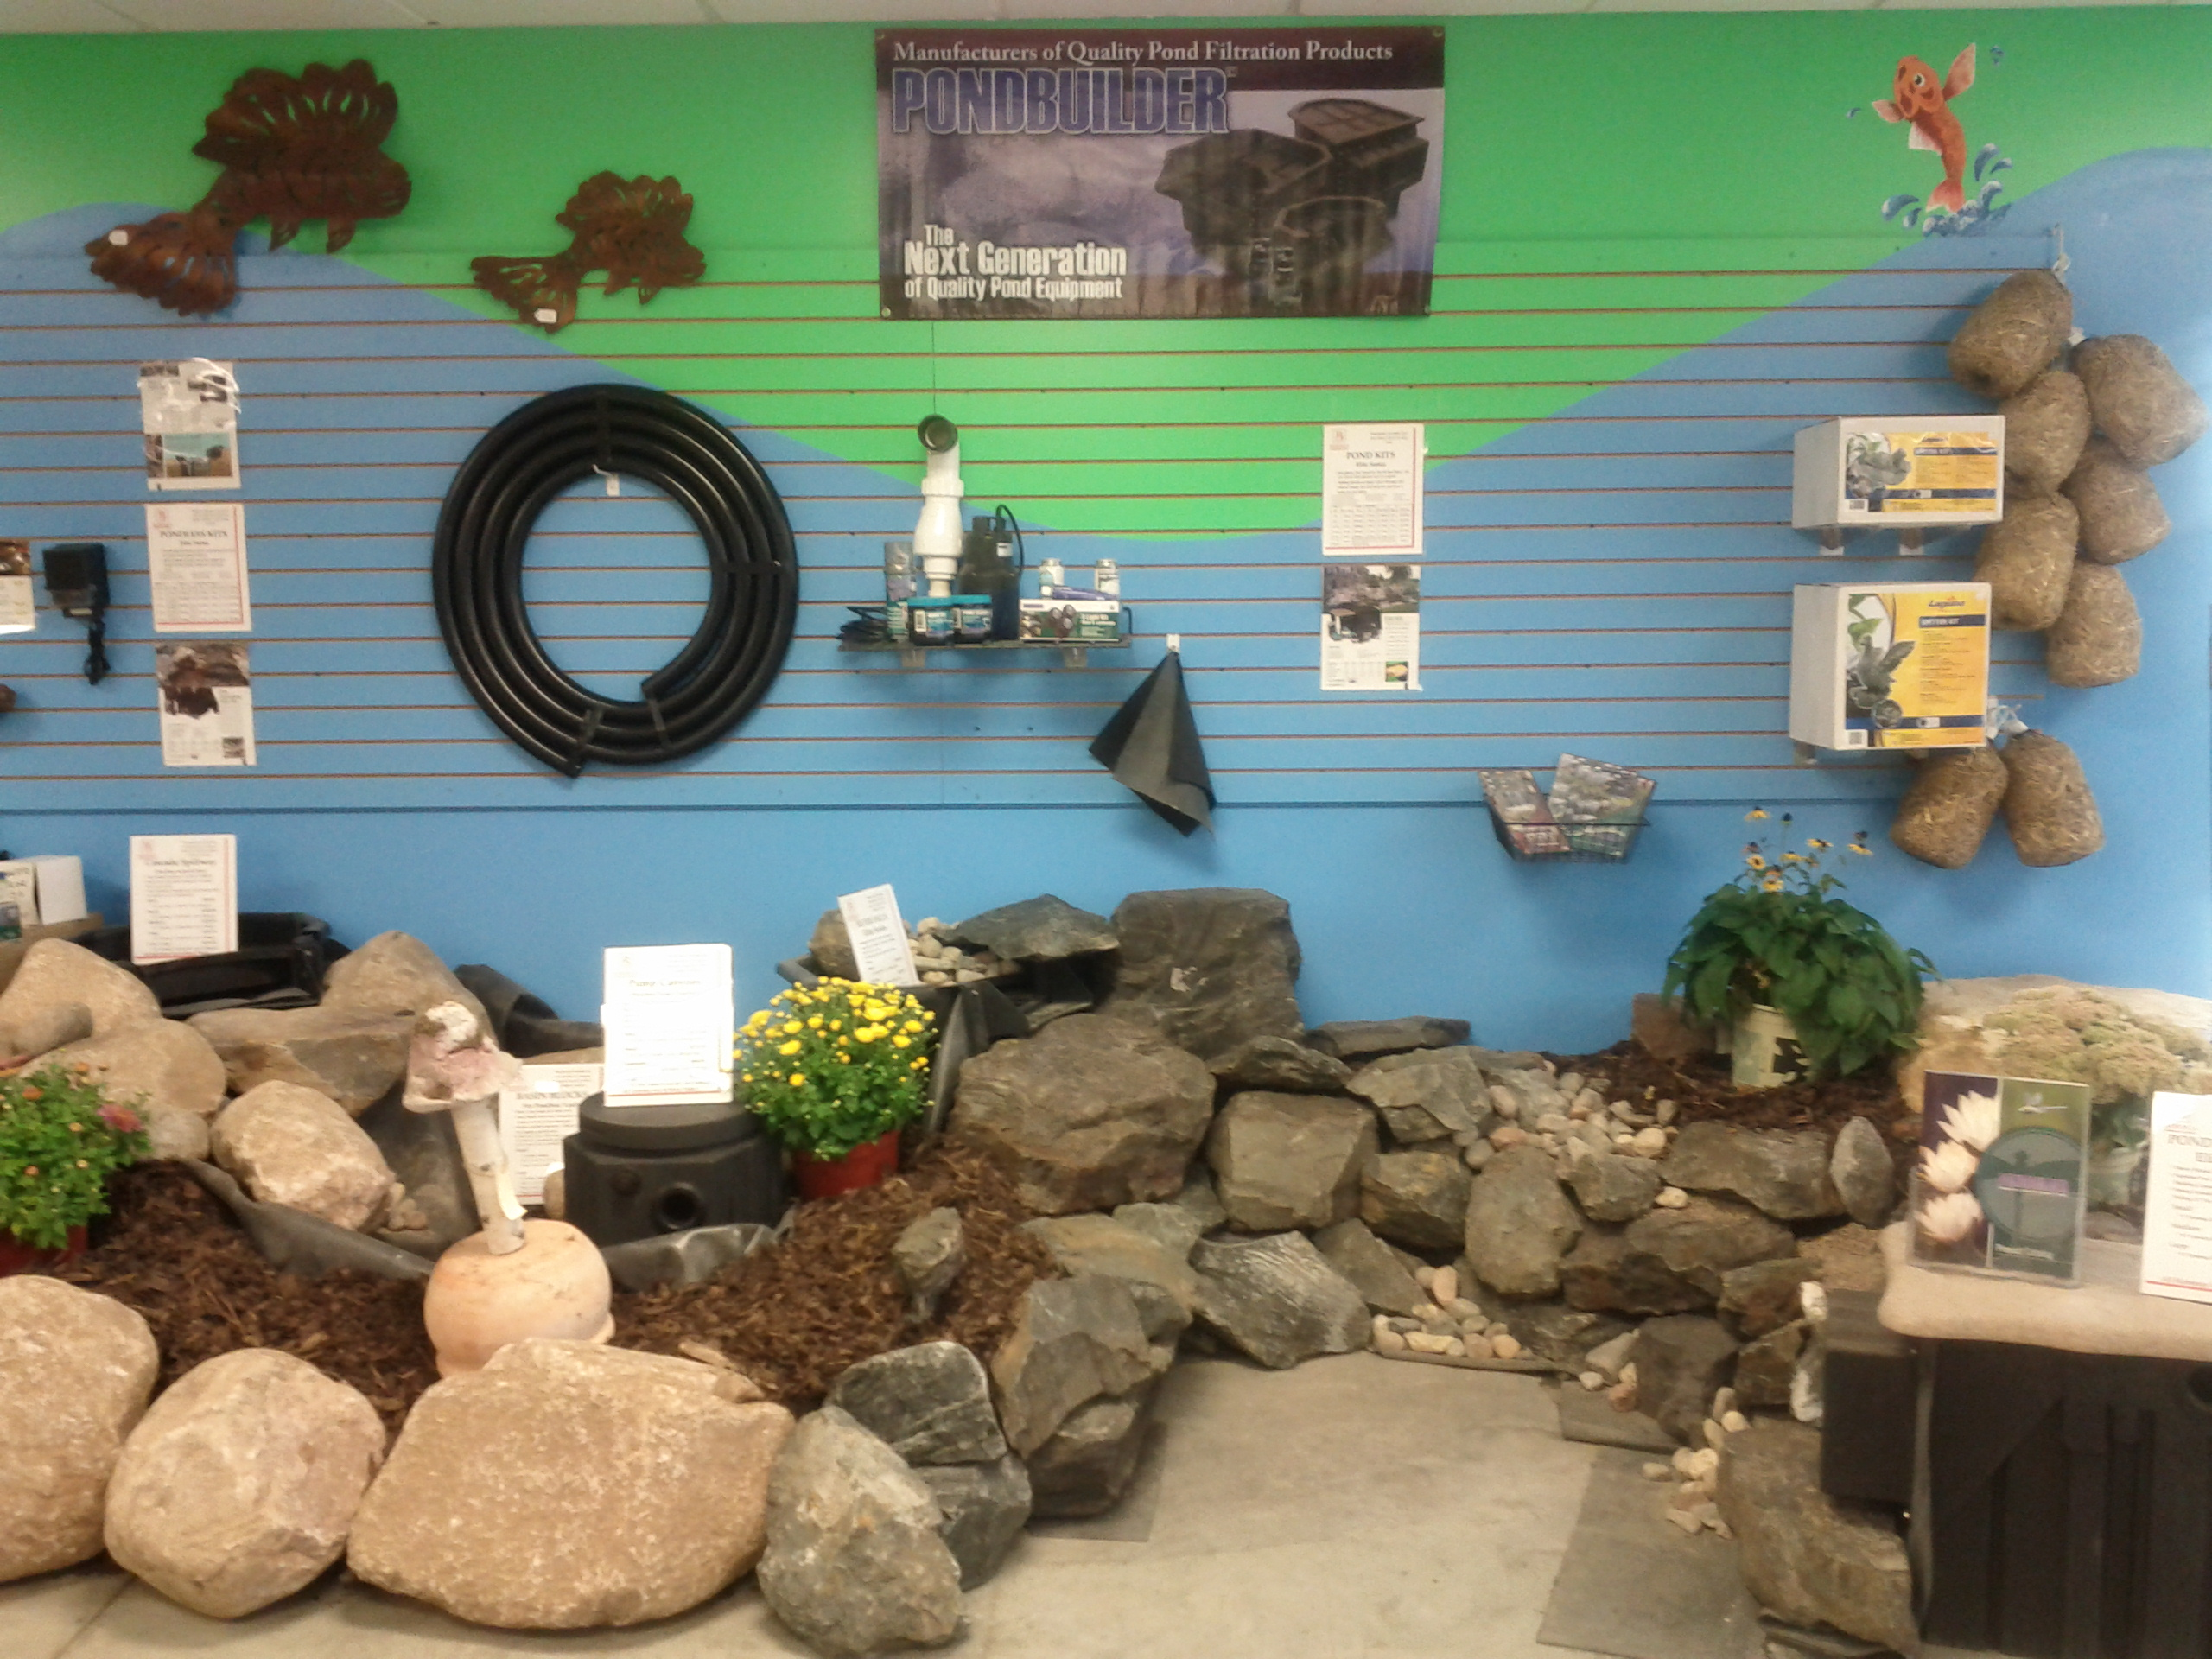 PondBuilder display